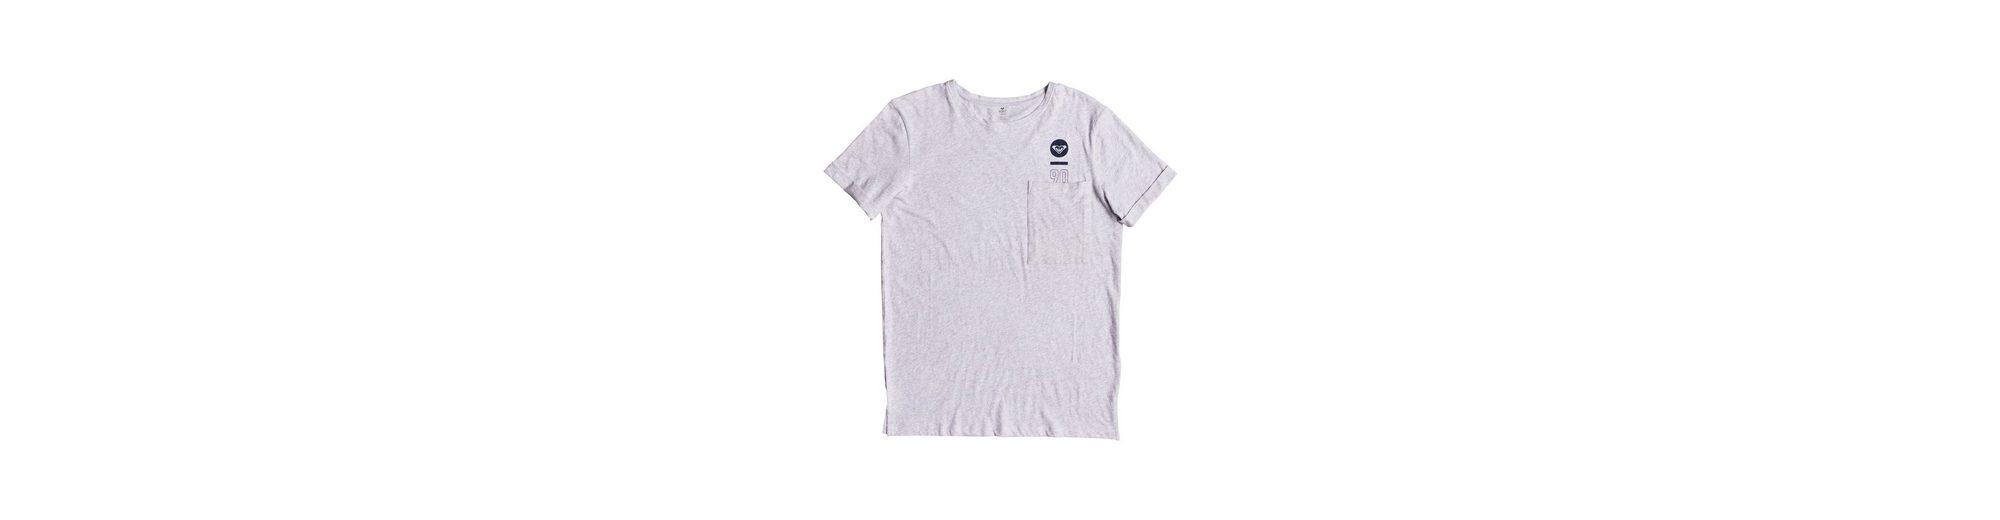 You You Roxy Shirt Challenge T Challenge Shirt Roxy A T Roxy A xvgIanq